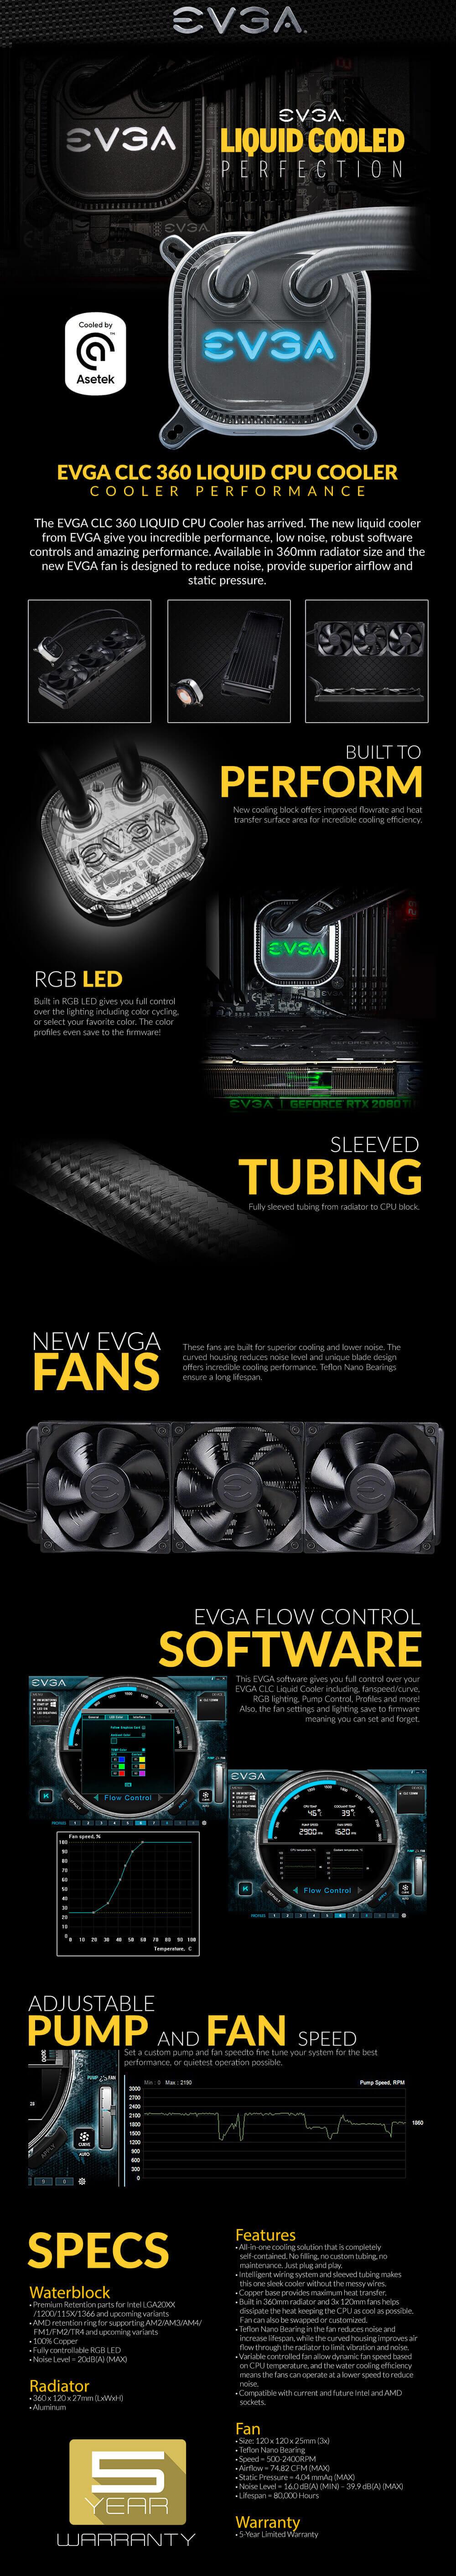 EVGA CLC 360mm All-In-One RGB LED CPU Liquid Cooler - 3x FX12 120mm PWM Fans